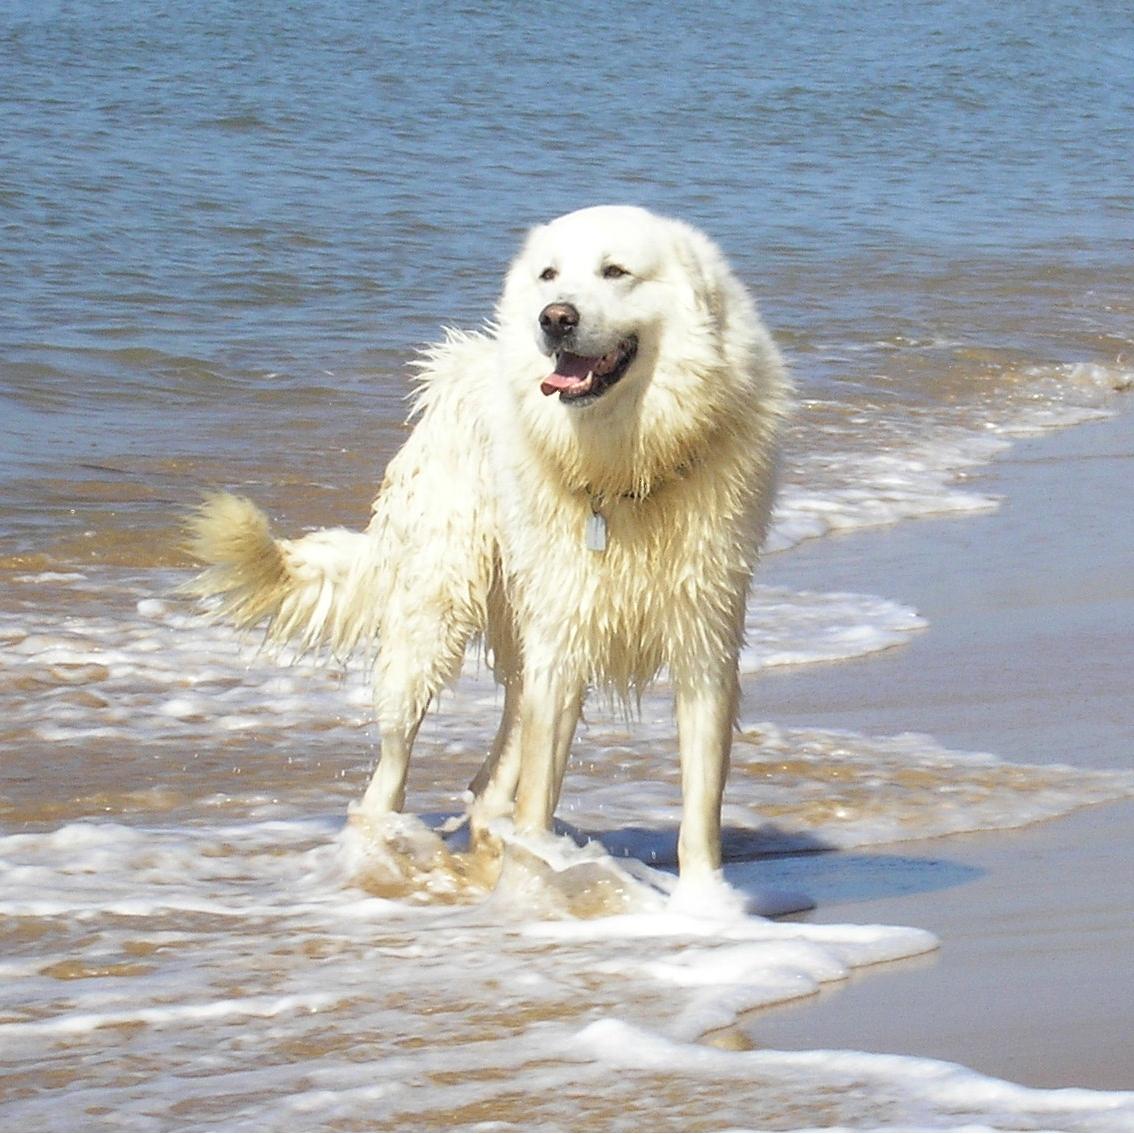 Maremma dogs help guard wildlife